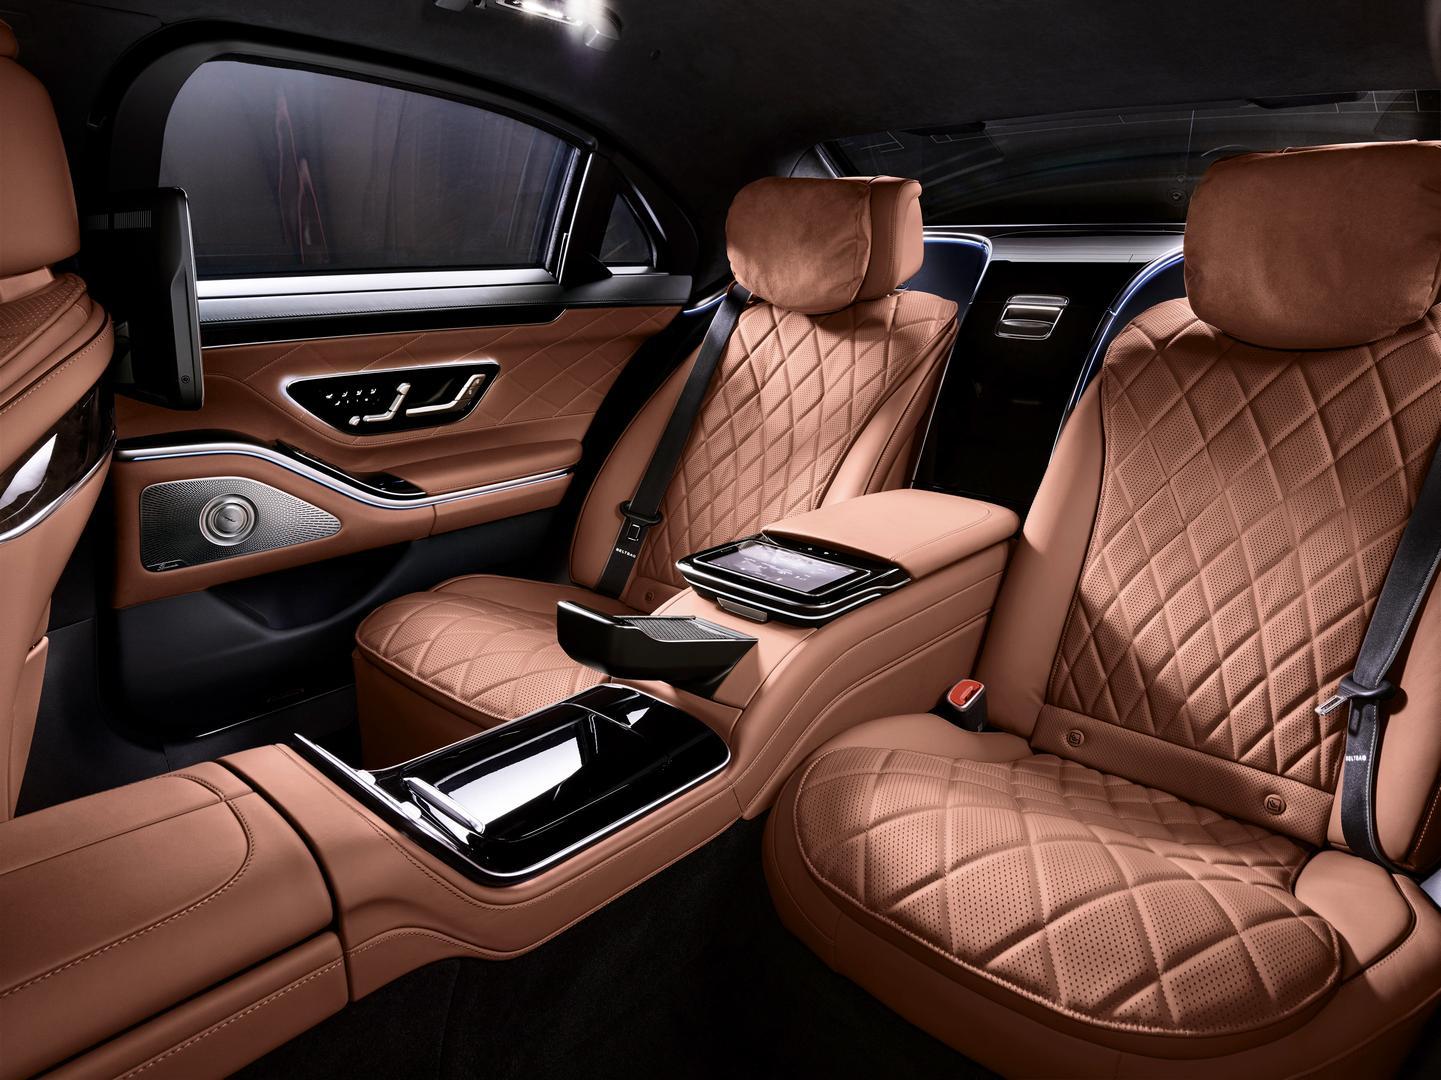 Mercedes-Benz S 680 GUARD cabin